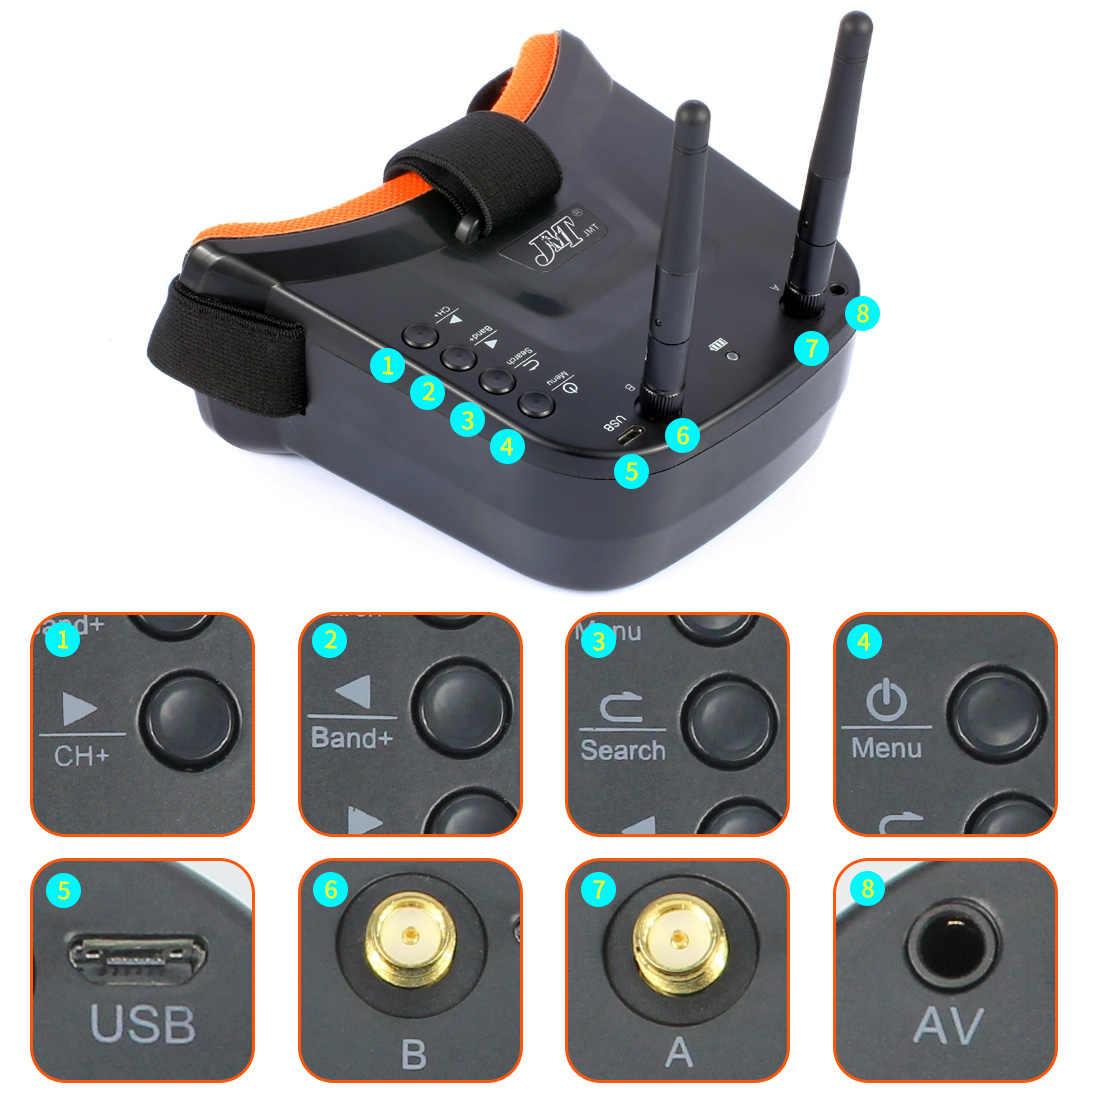 T180 4 pouces 5.8G FPV course Drone HD caméra bébé tortue 800TVL Betaflight F4 Pro V2 OSD Brushless 3S 2.4G 6CH RC quadrirotor RTF